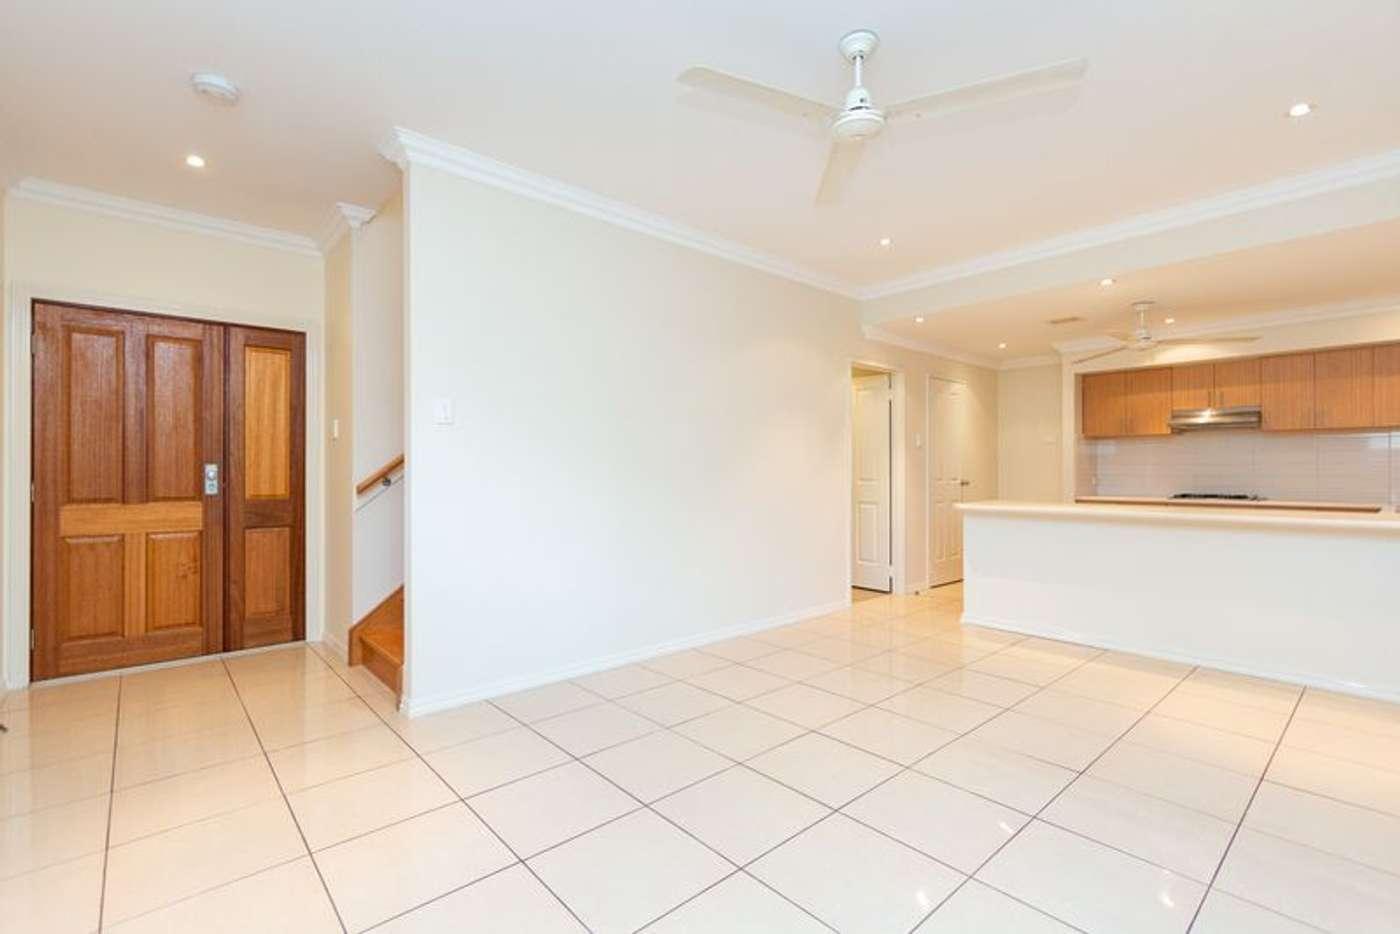 Seventh view of Homely house listing, 4/6 Ibis Way, Djugun WA 6725